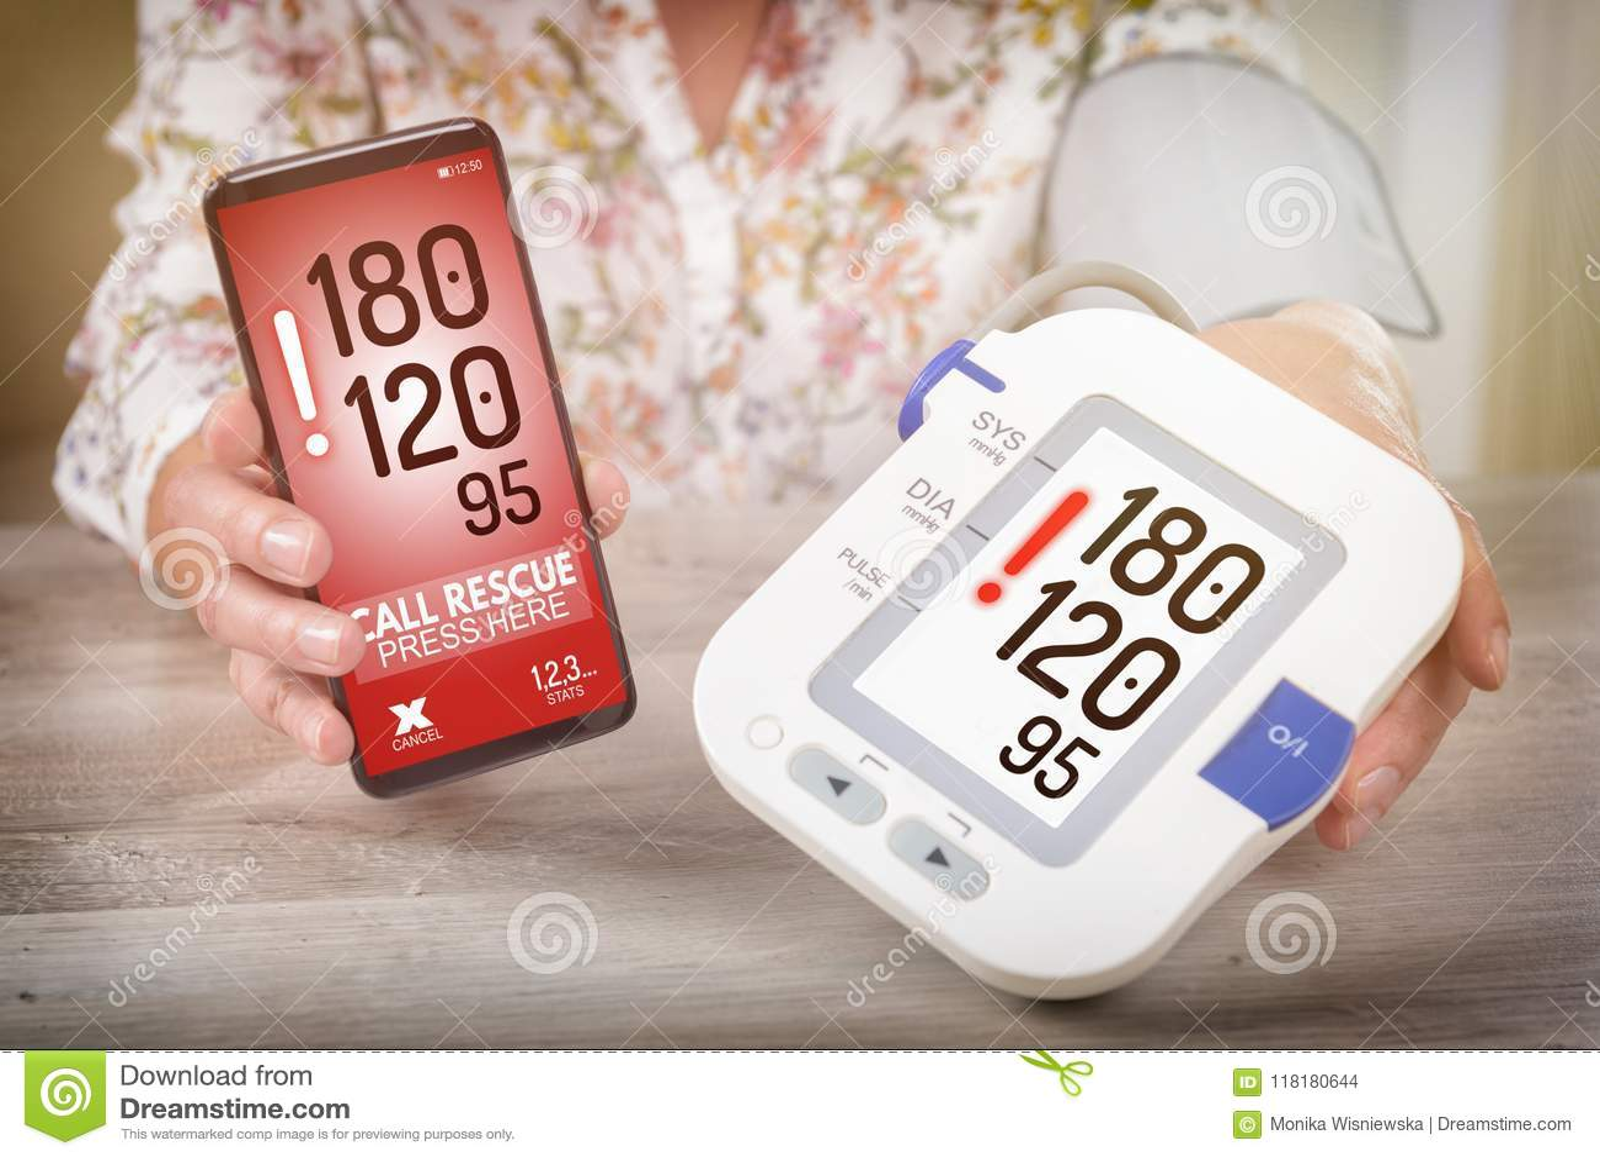 Hoge bloeddruk die - hulp met slimme telefoon app verzoeken